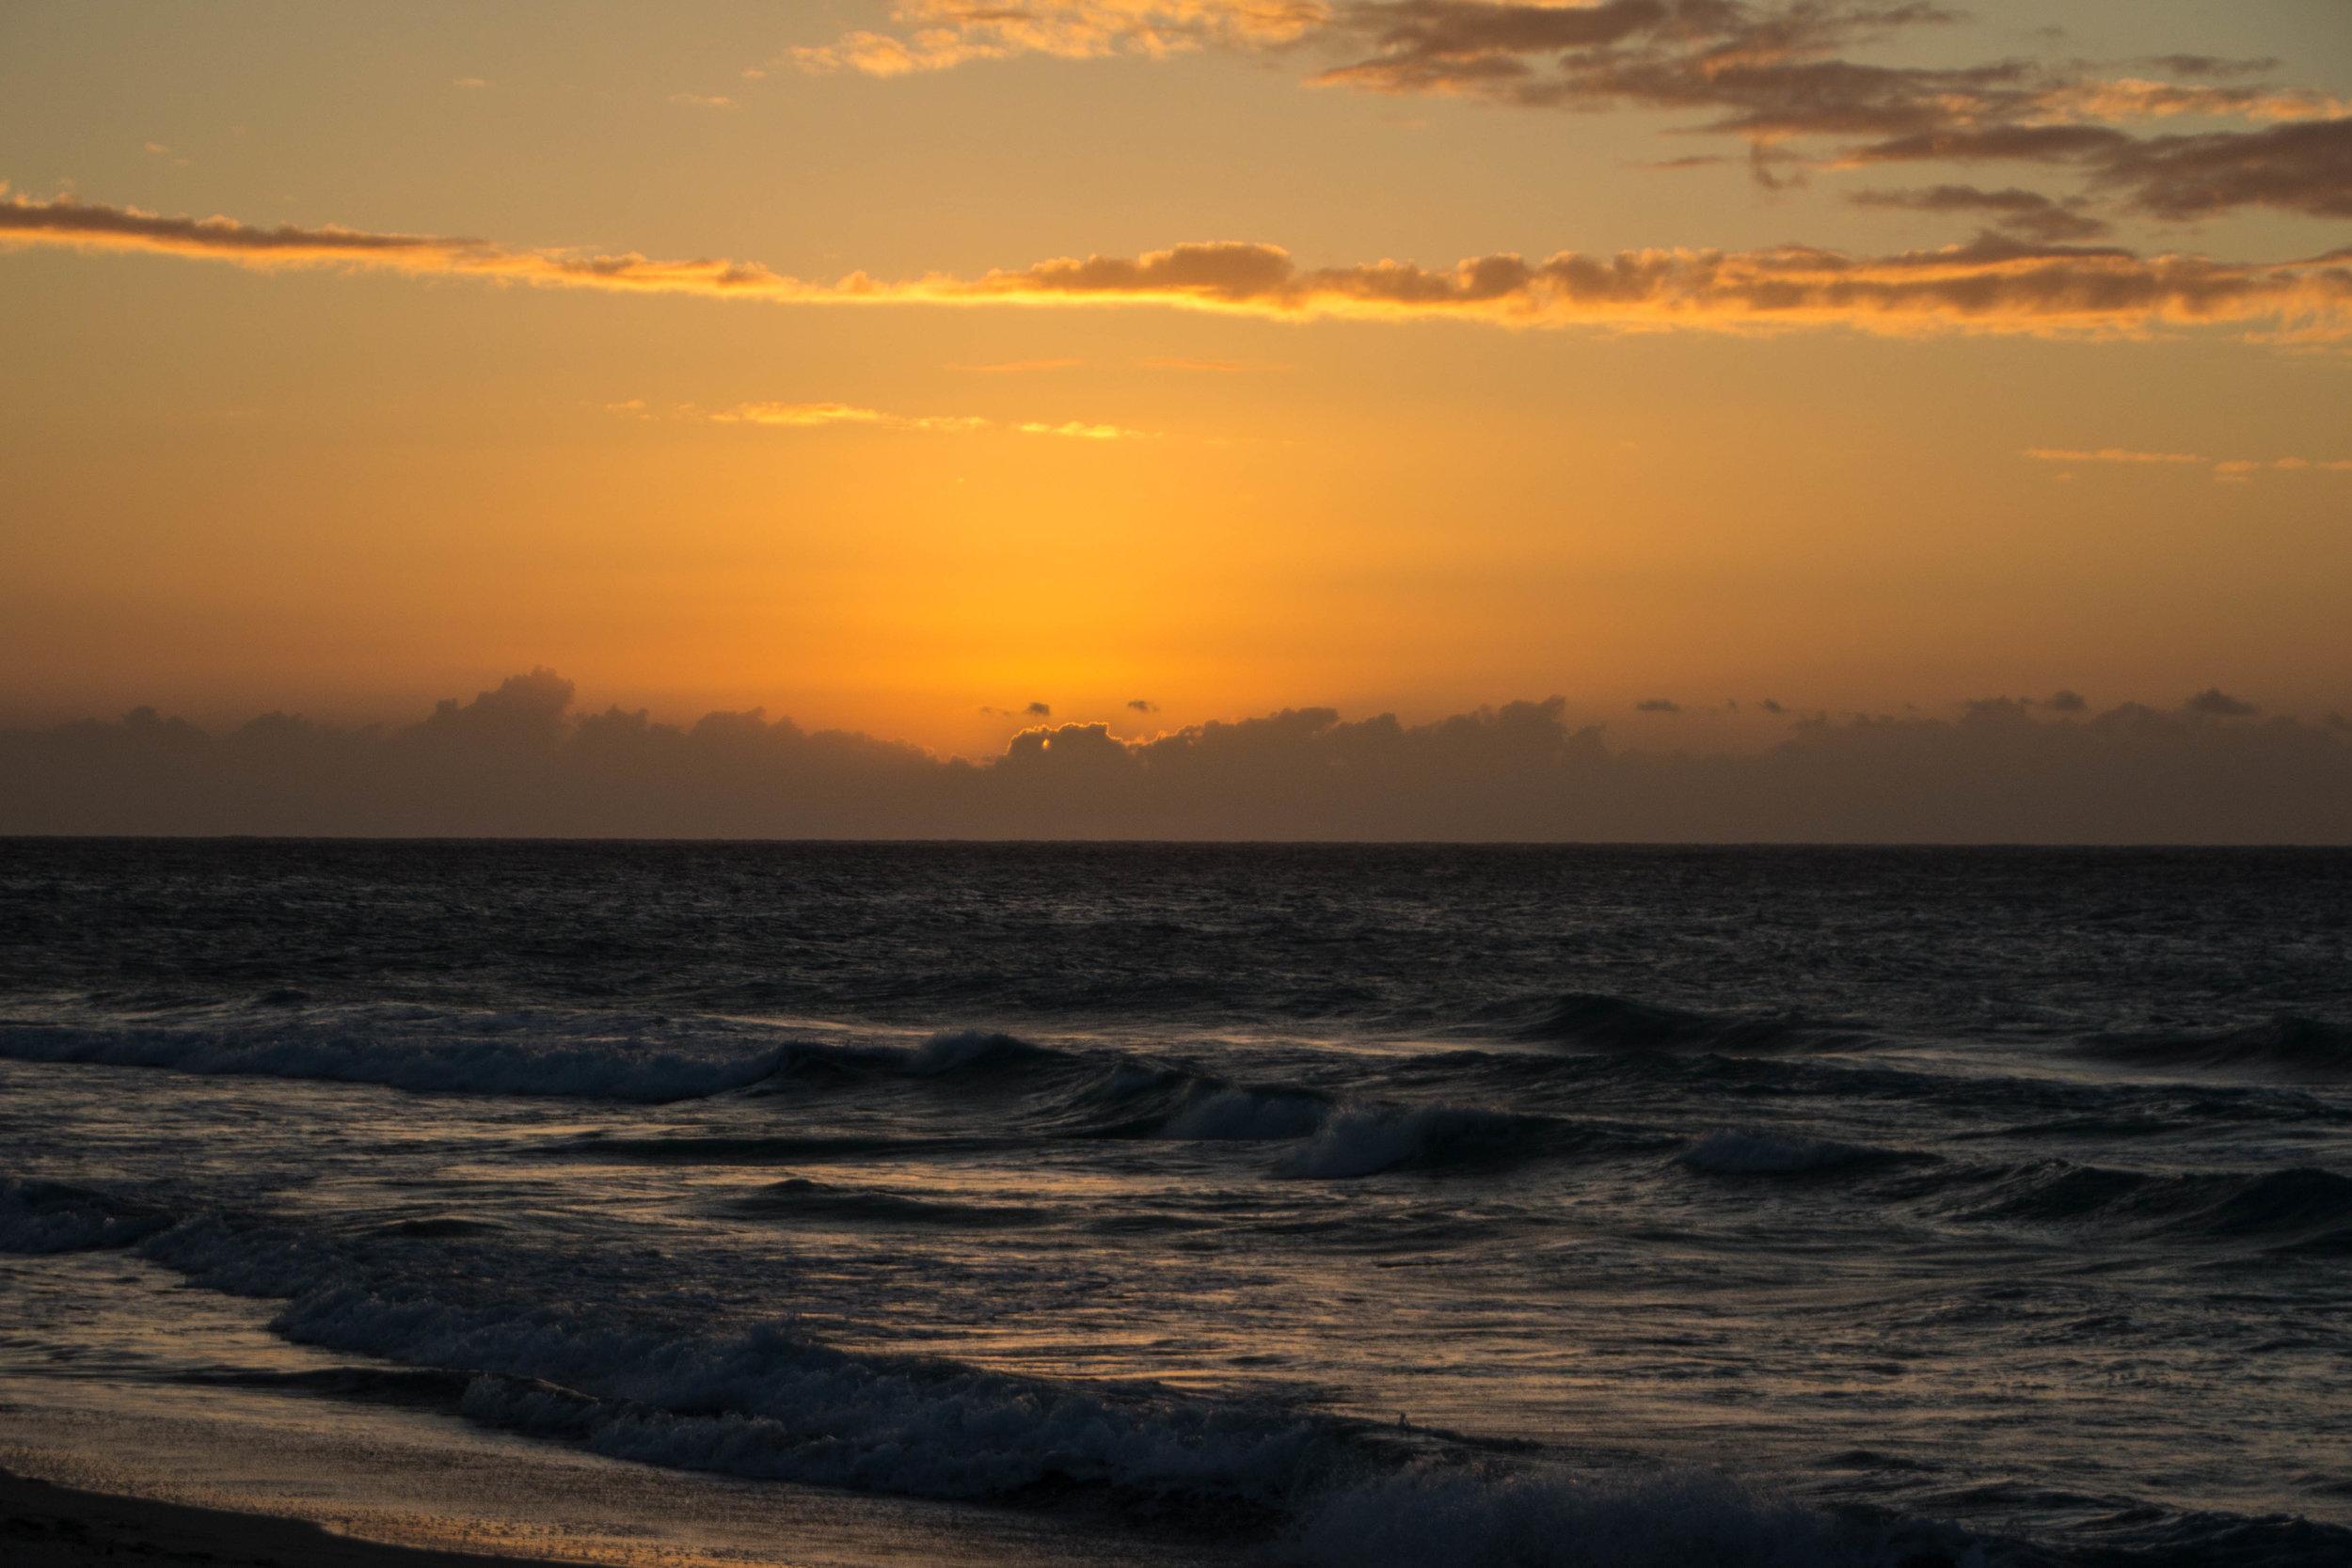 beaches varadero cuba sunset-1-4-2.jpg